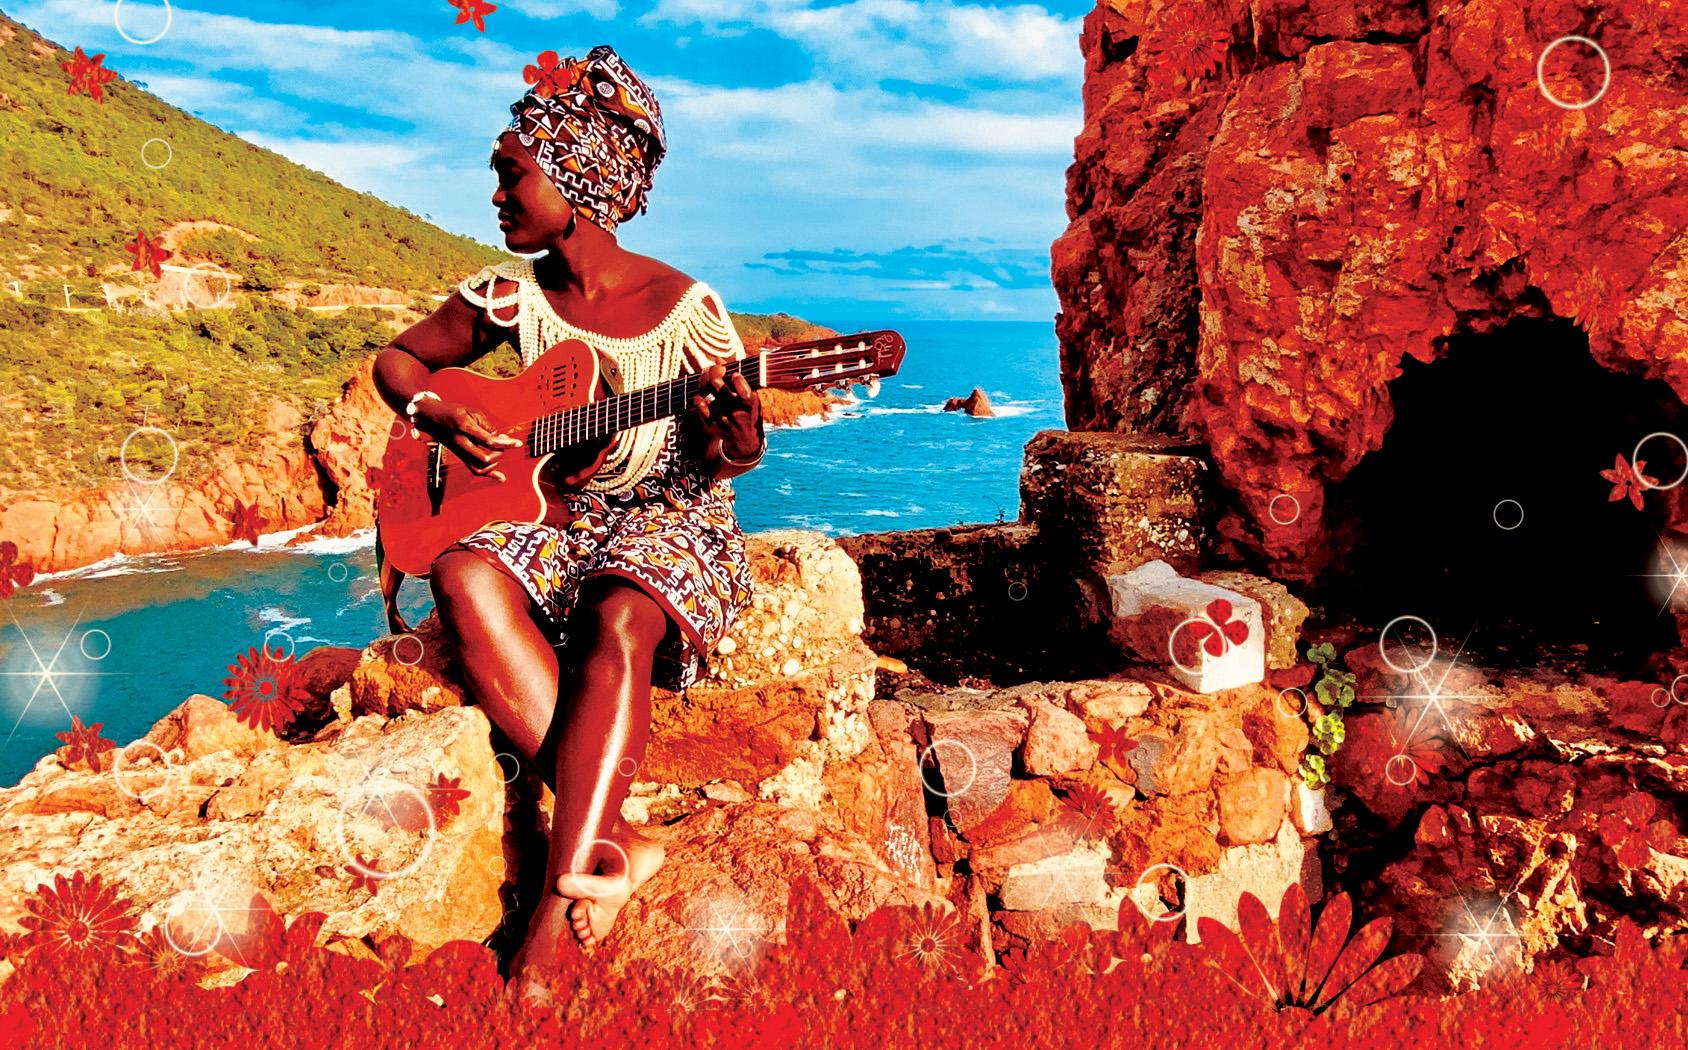 Habari Africa Virtual Festival 2021 : Mariaa Siga